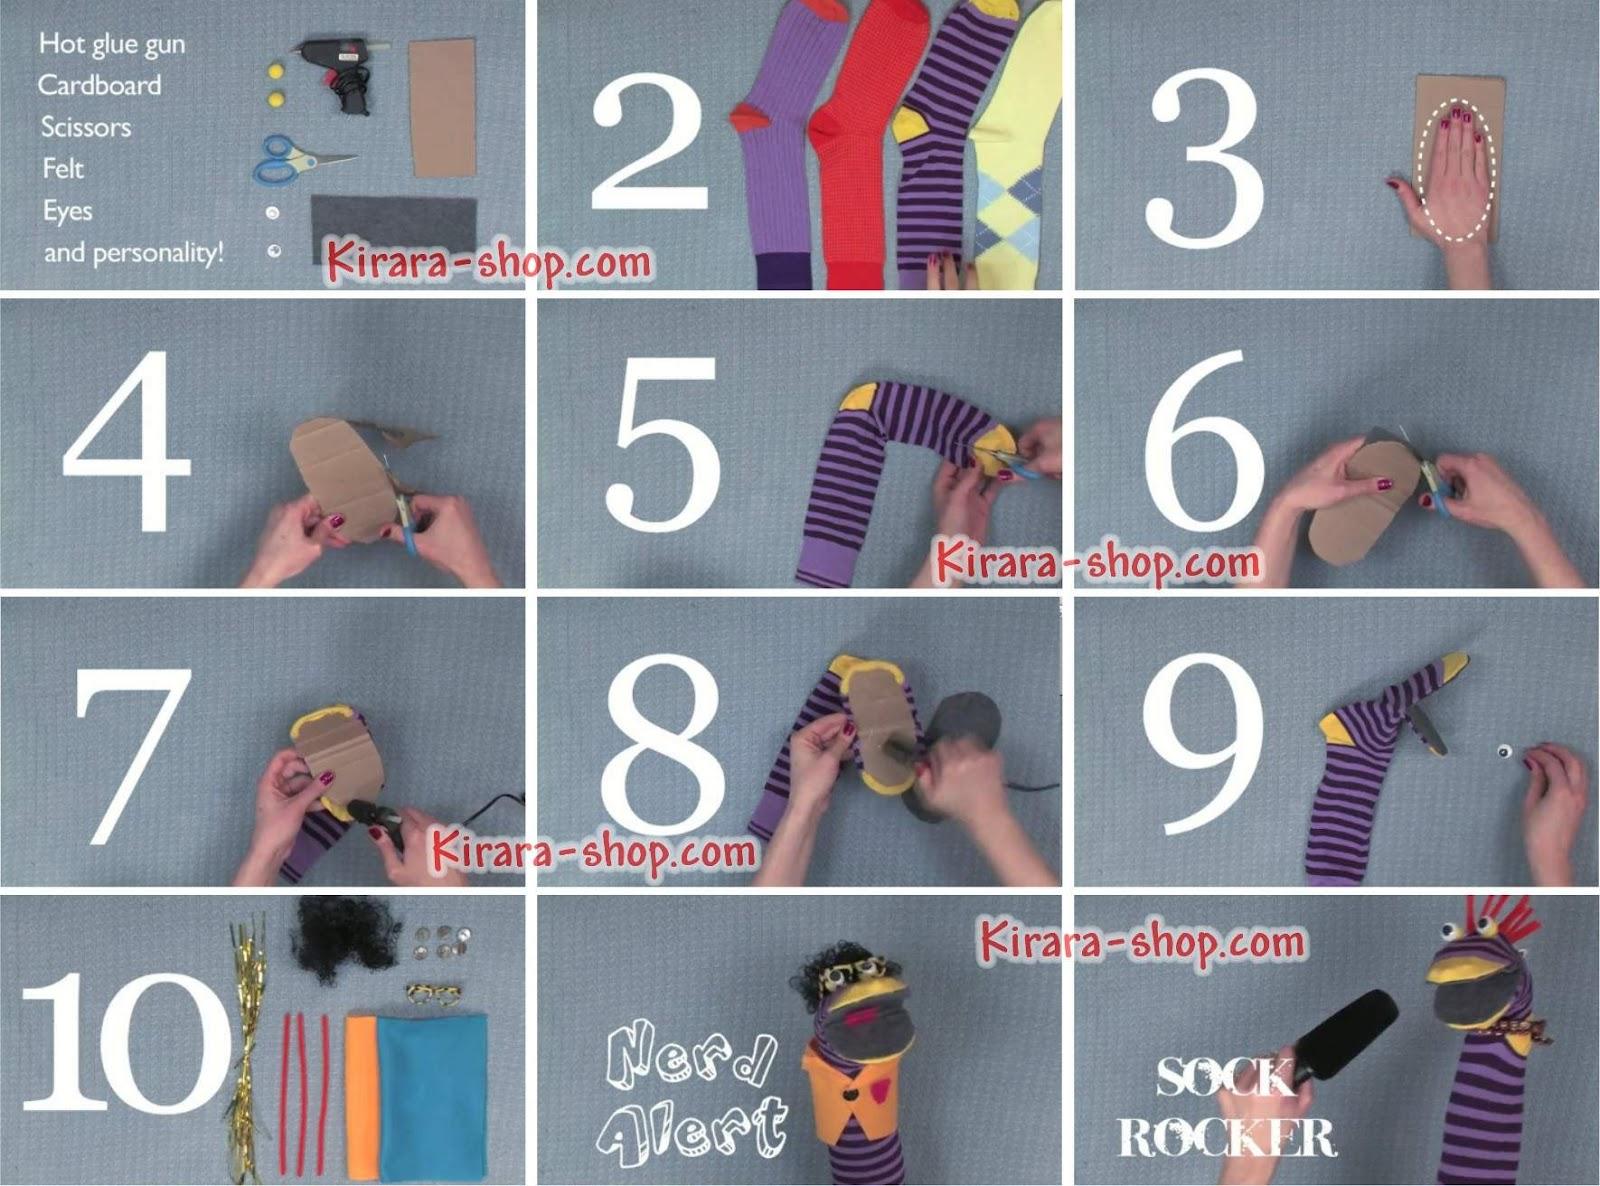 boneka%2C+finger+puppet%2C+dolls%2C+boneka%2C+boneka+tangan%2C+boneka